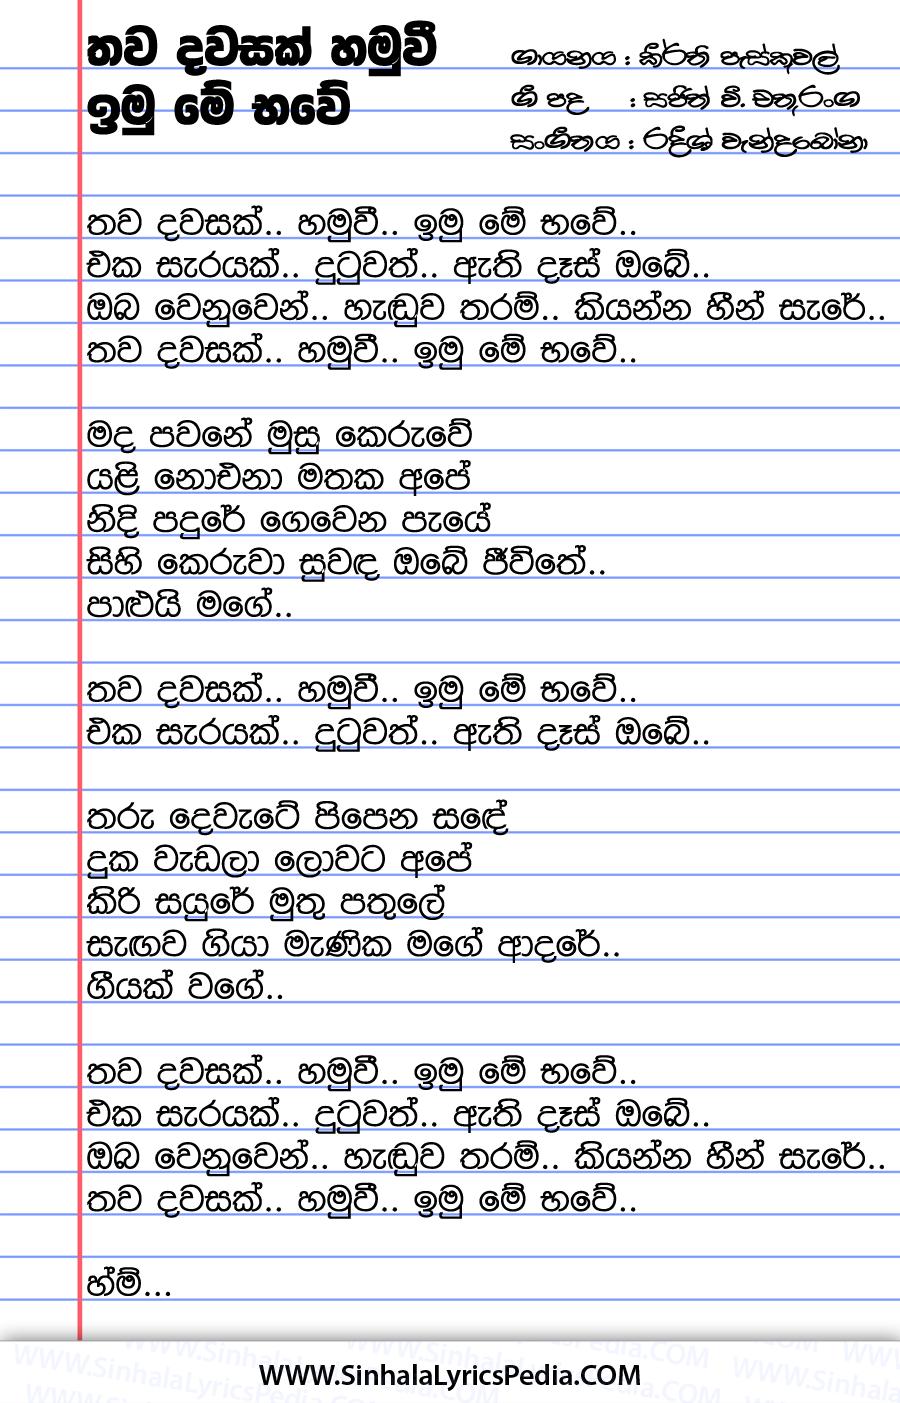 Thawa Dawasak Hamuwee Song Lyrics